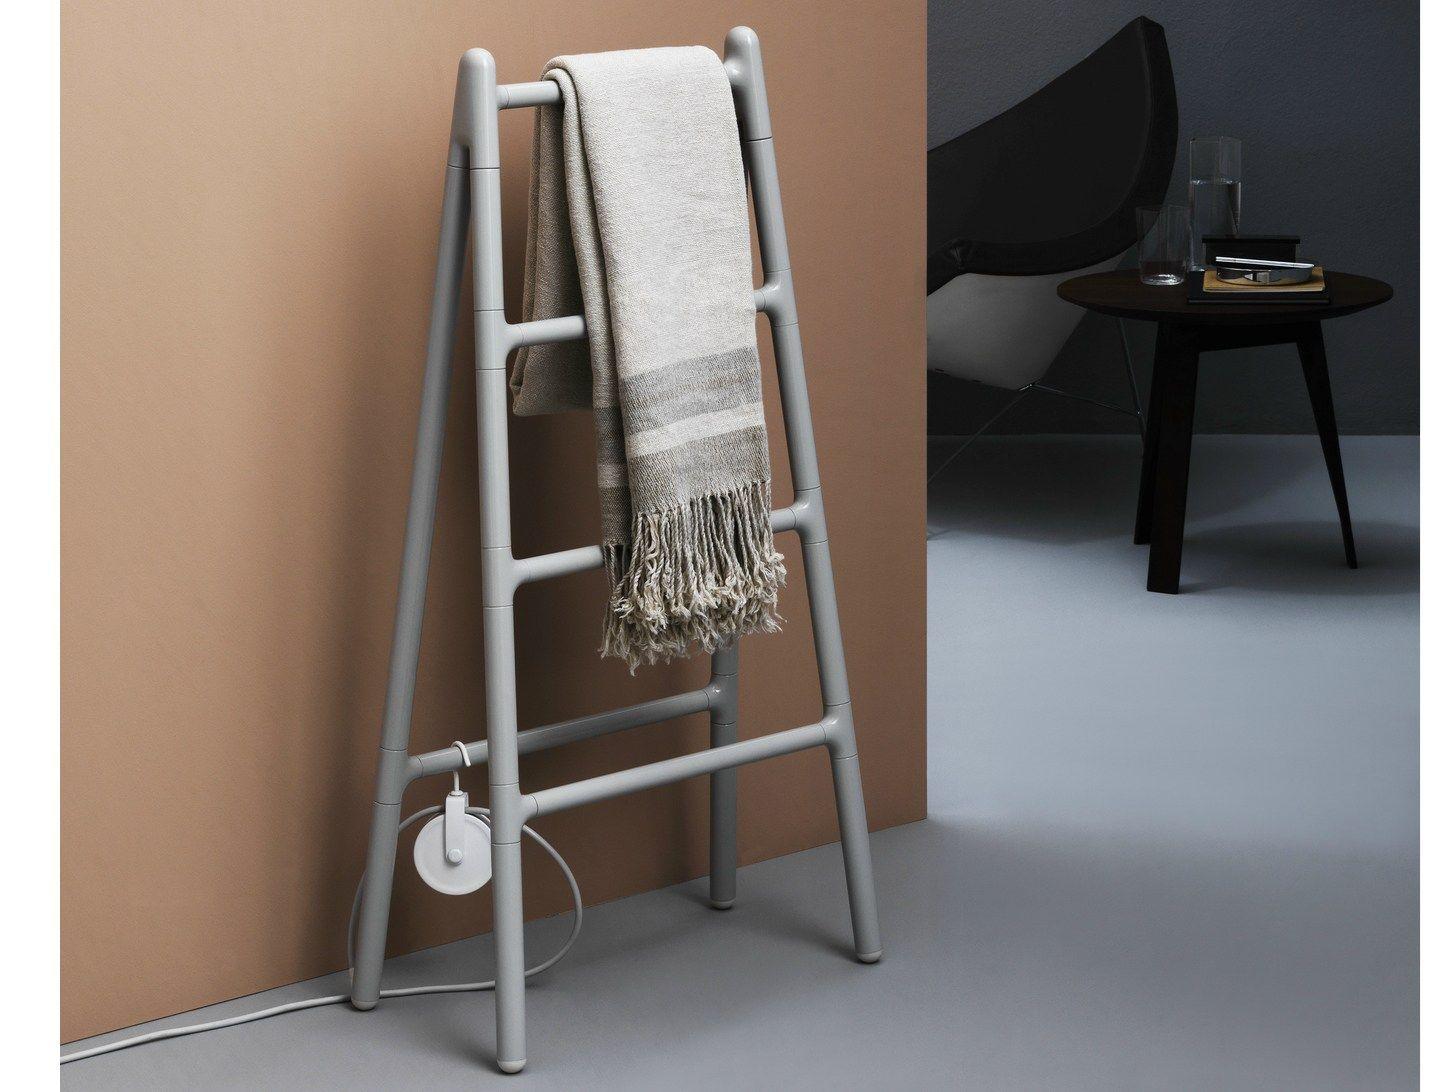 Heizkörper badezimmer ~ Scaletta stand heizkörper by tubes radiatori design elisa gargan